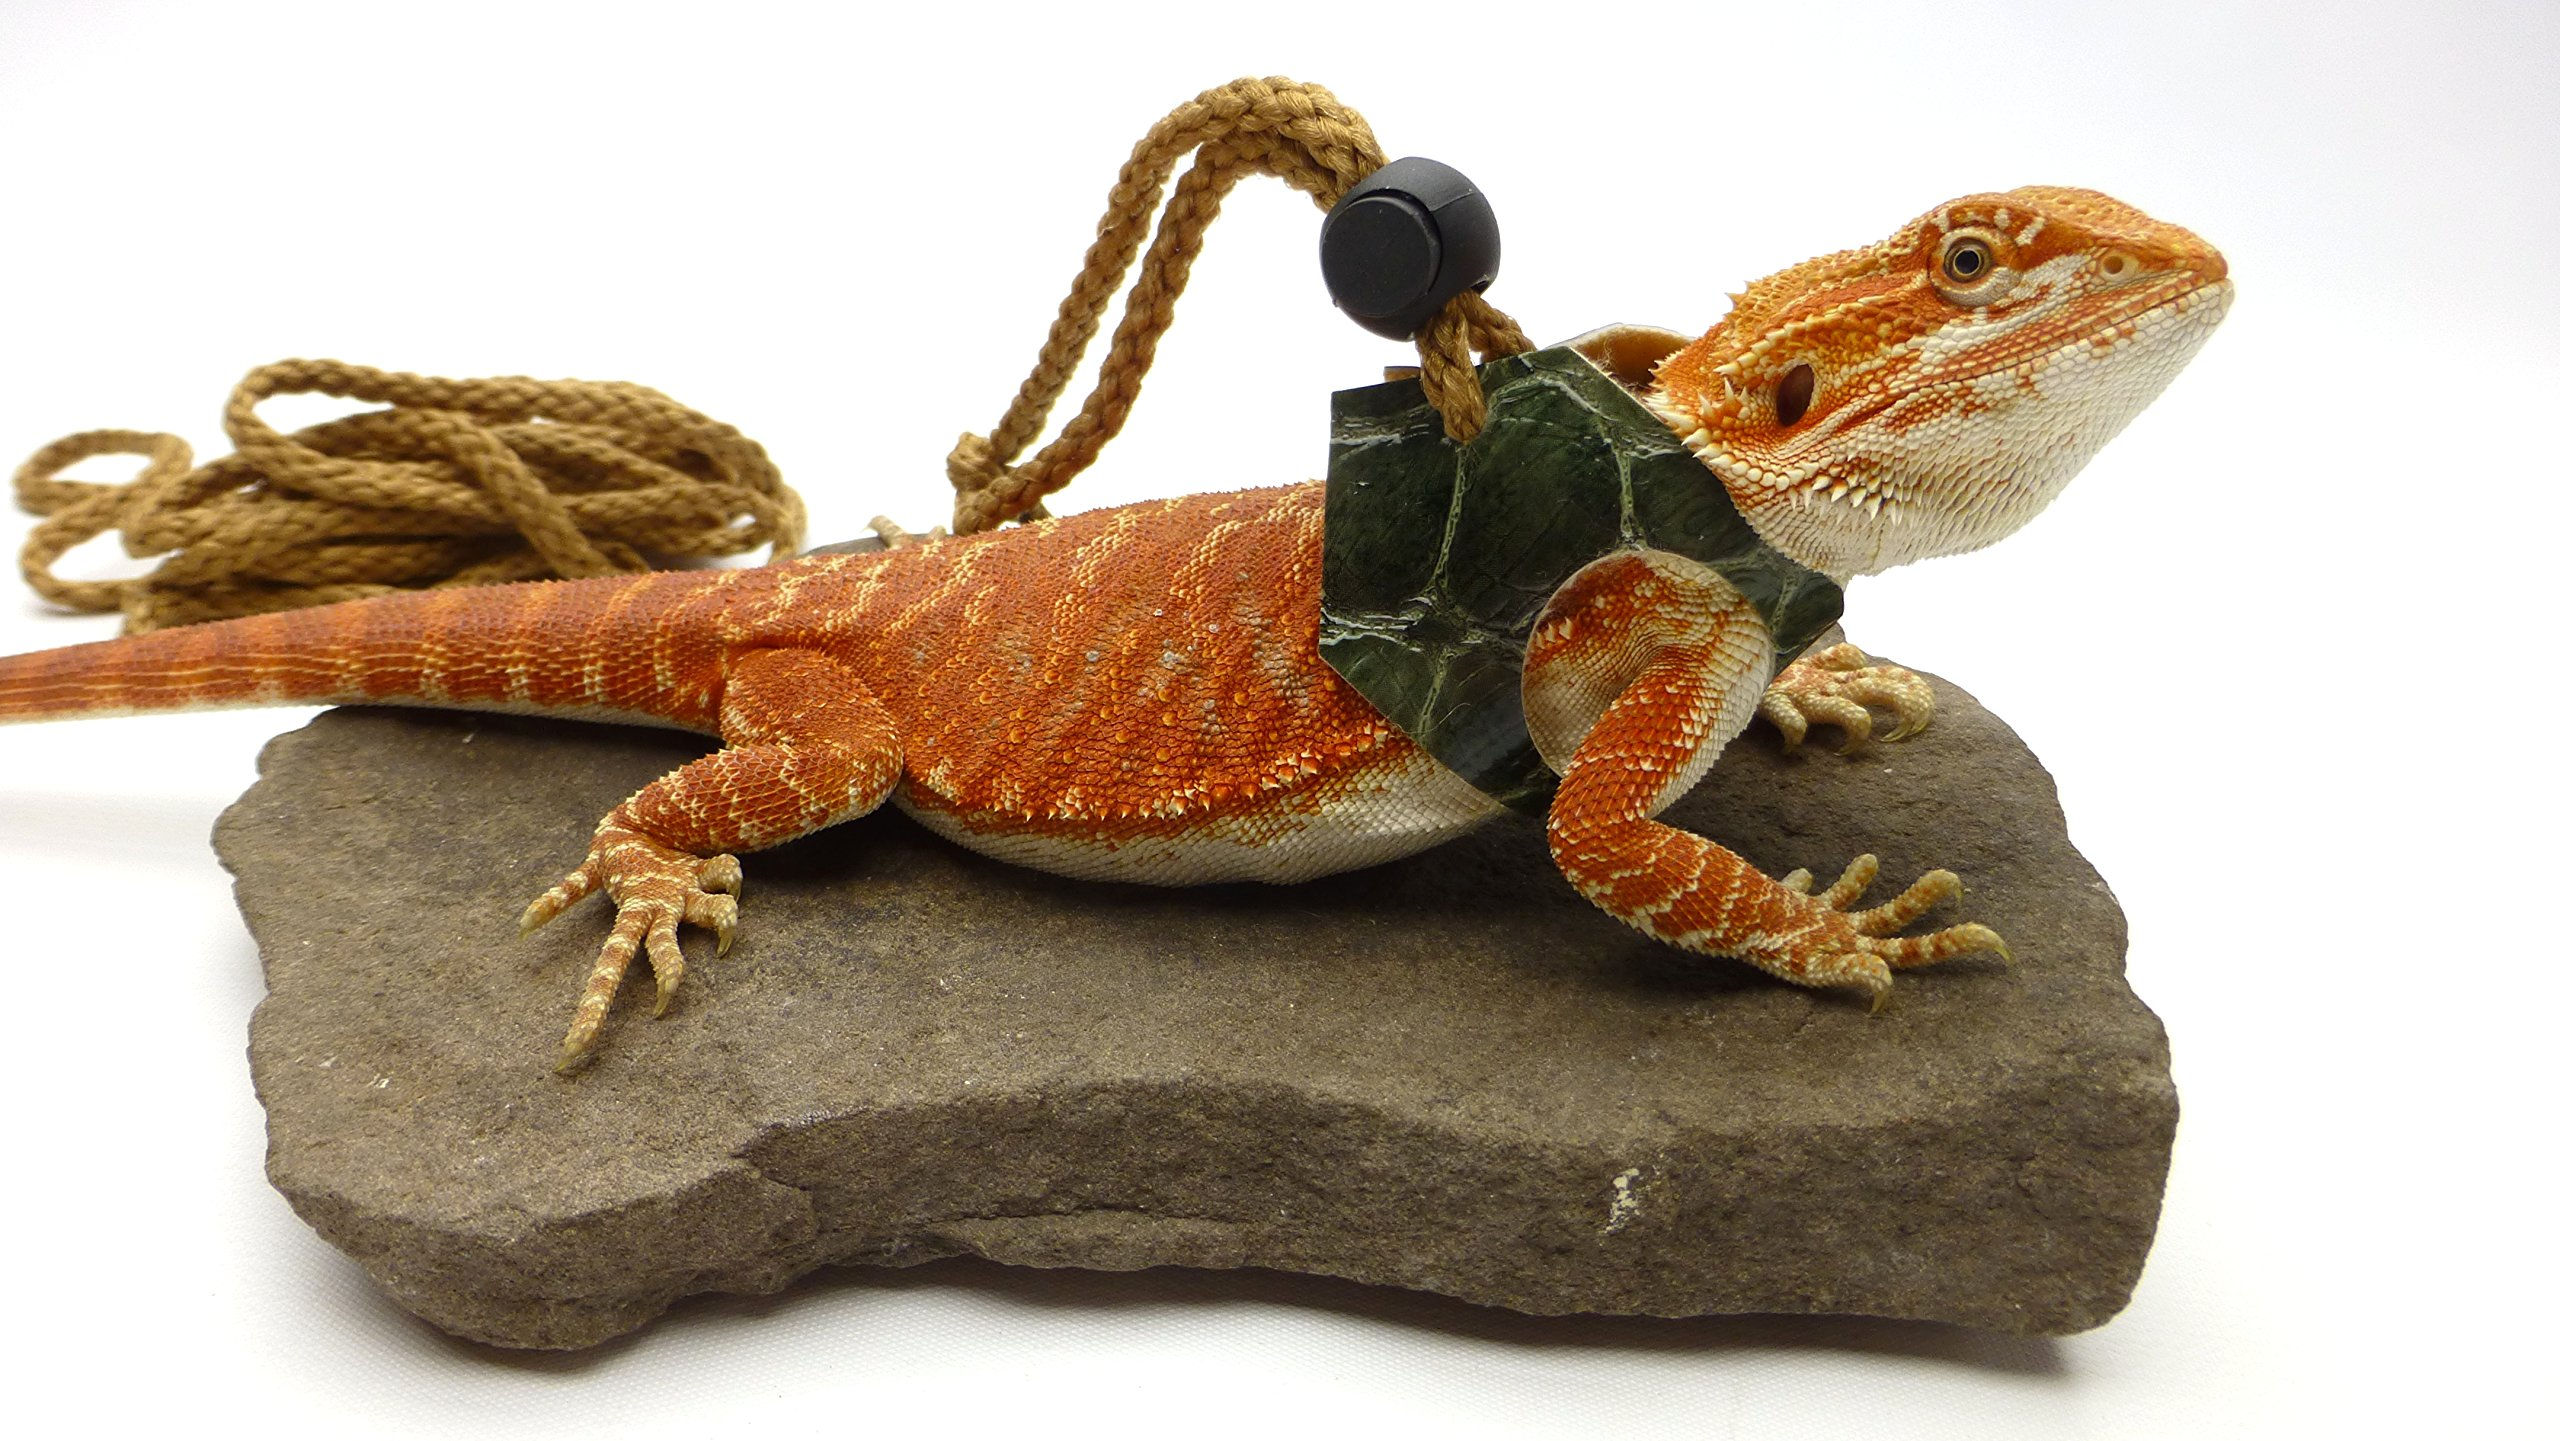 Ogle Lizard Leash, Limited Edition Green Scales (medium size)